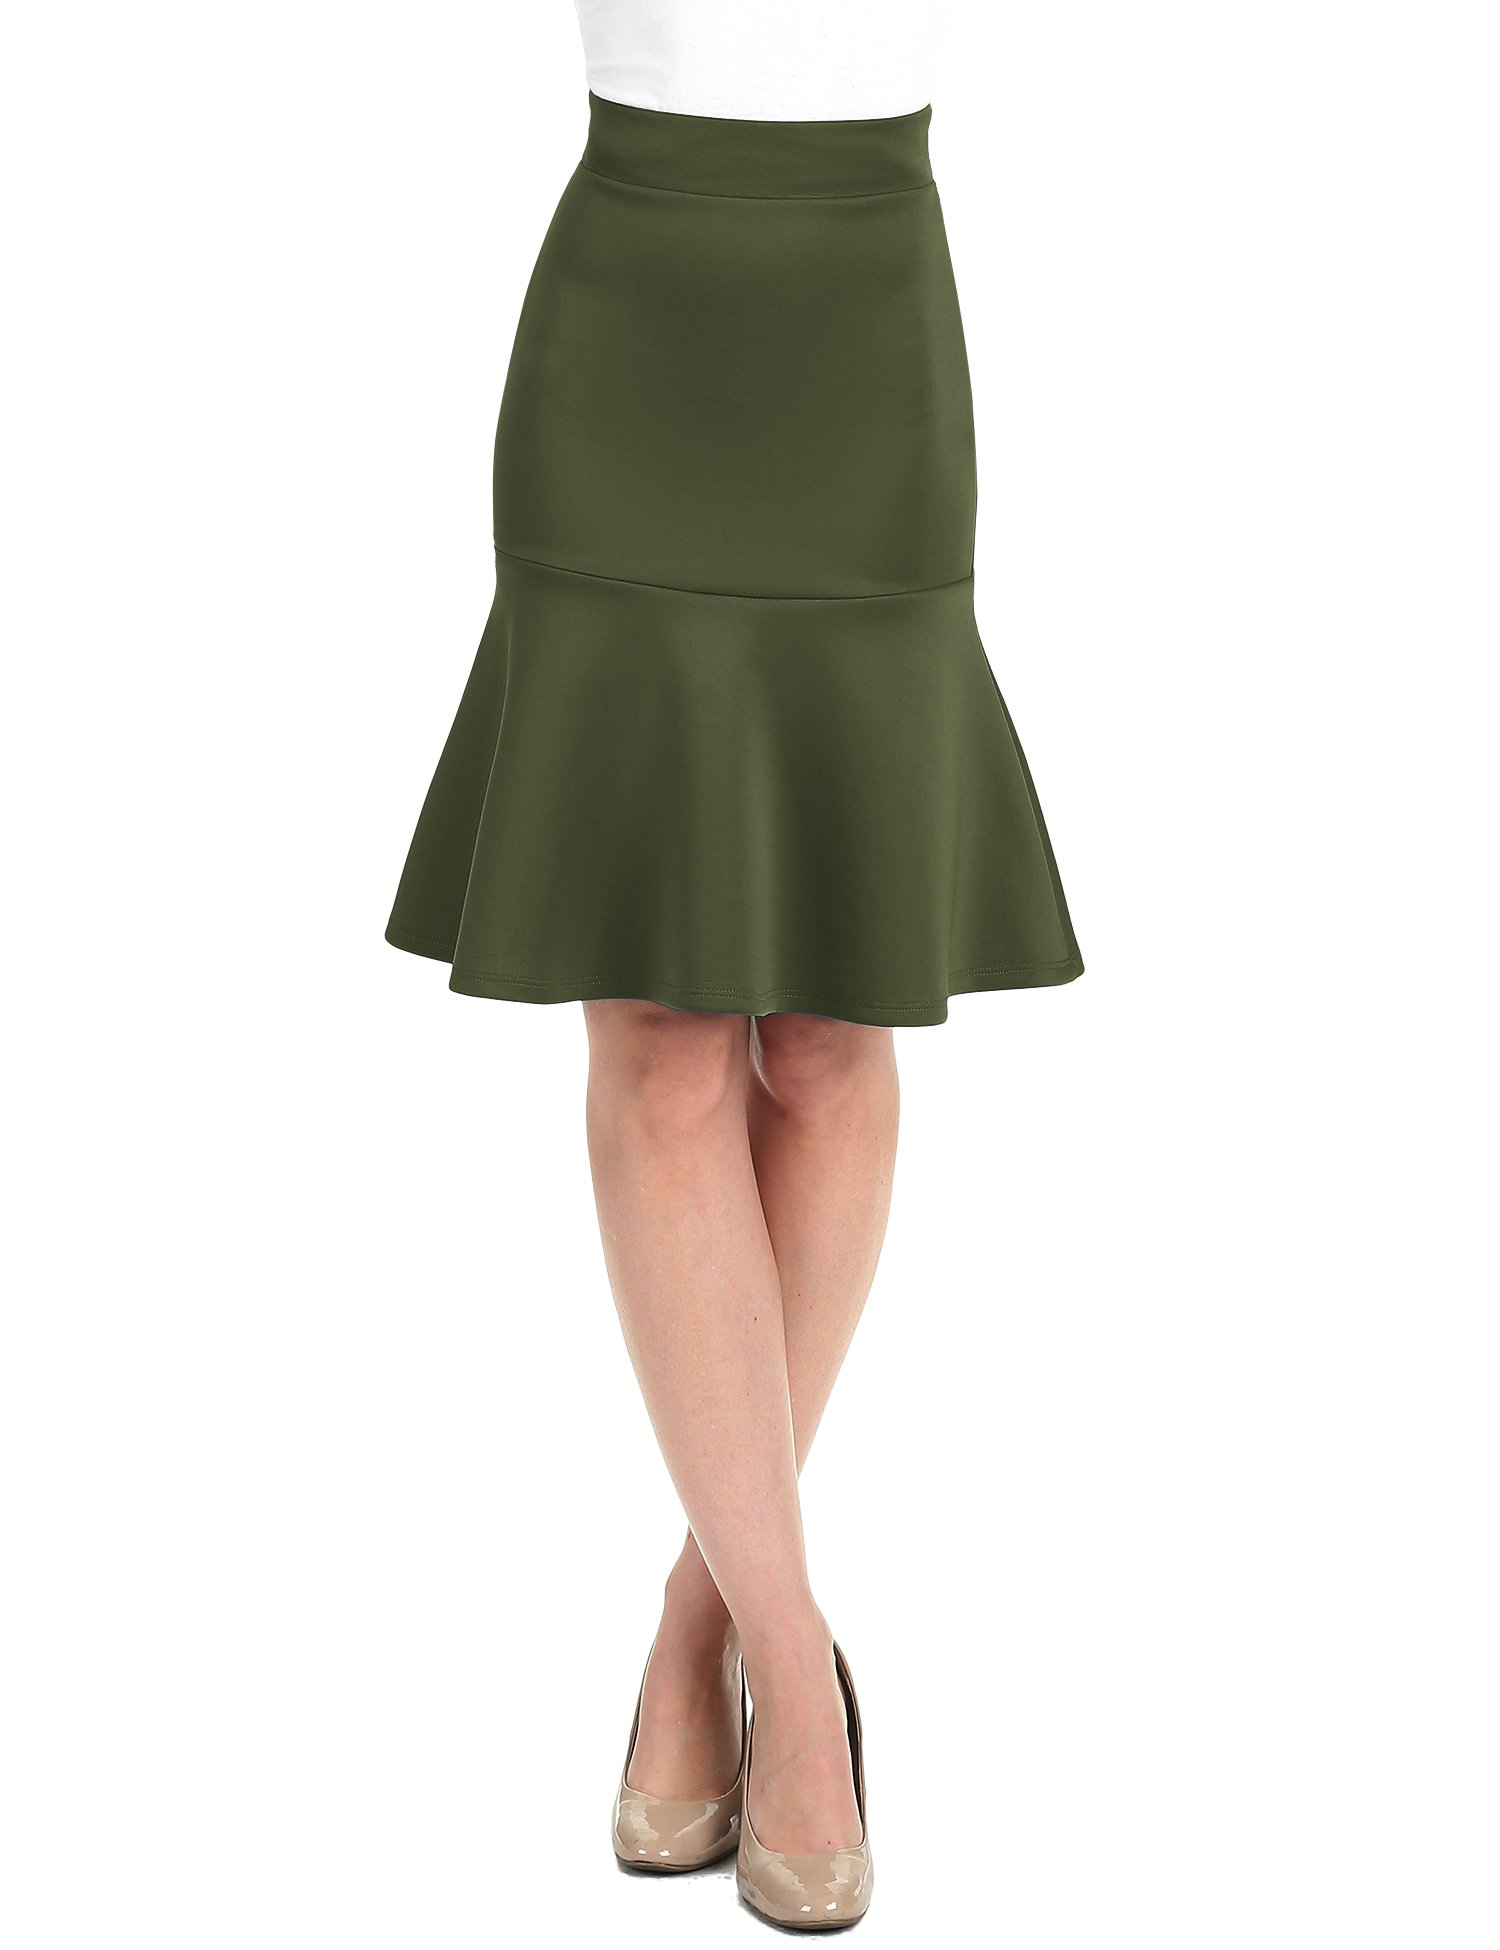 WT1471 Womens High Waist Bodycon Fishtail Midi Skirt XL Olive